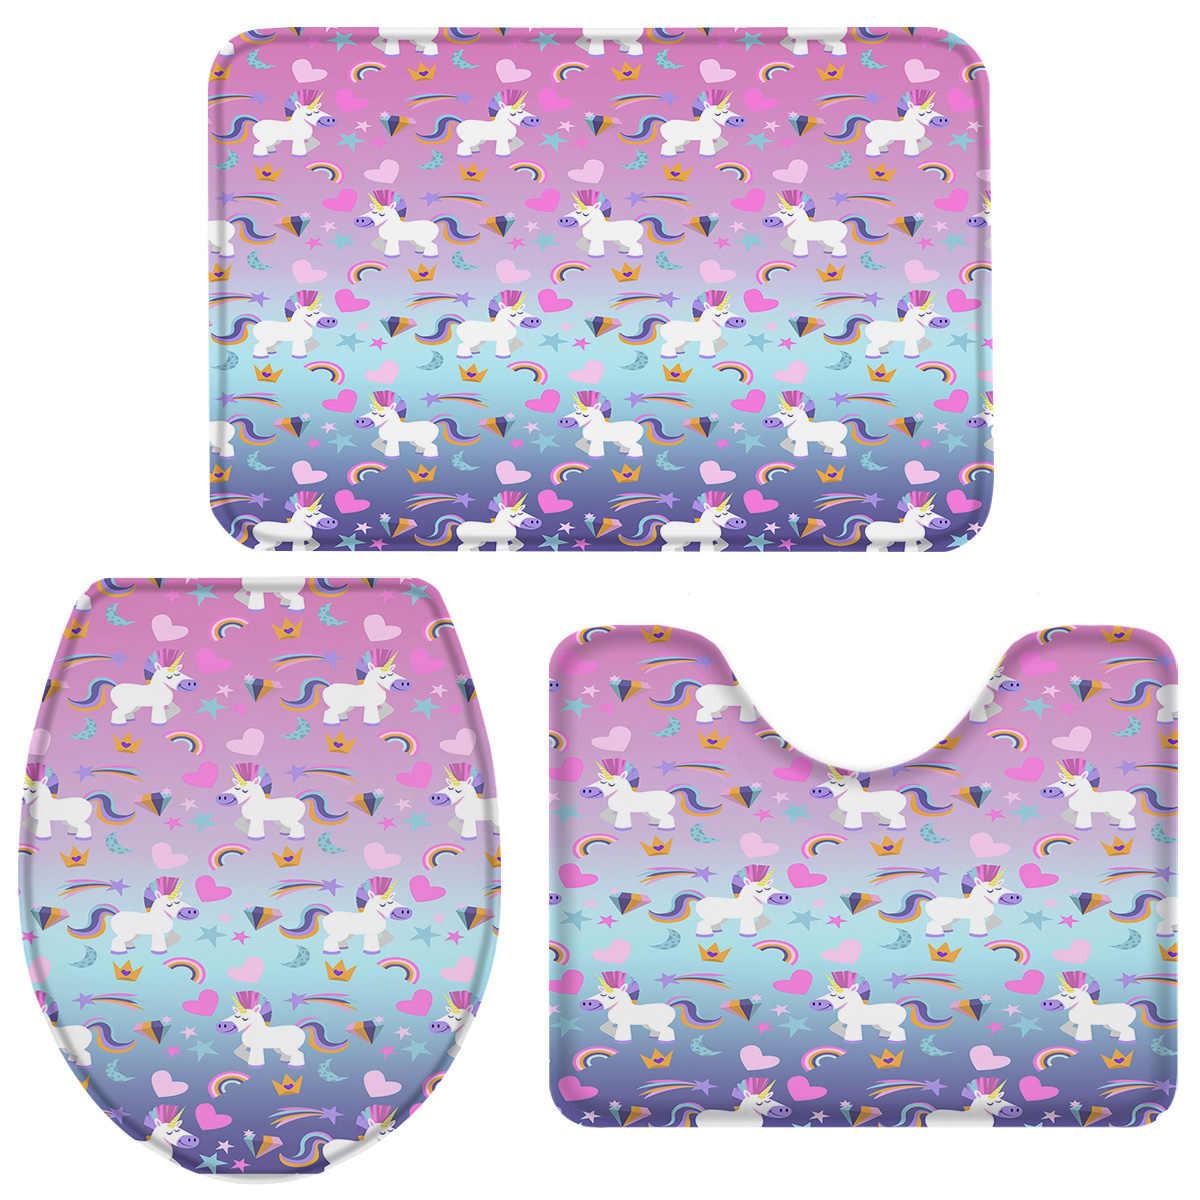 10 Pieces Bathroom Set Rainbow And Unicorn Diamond Bath Set Toilet